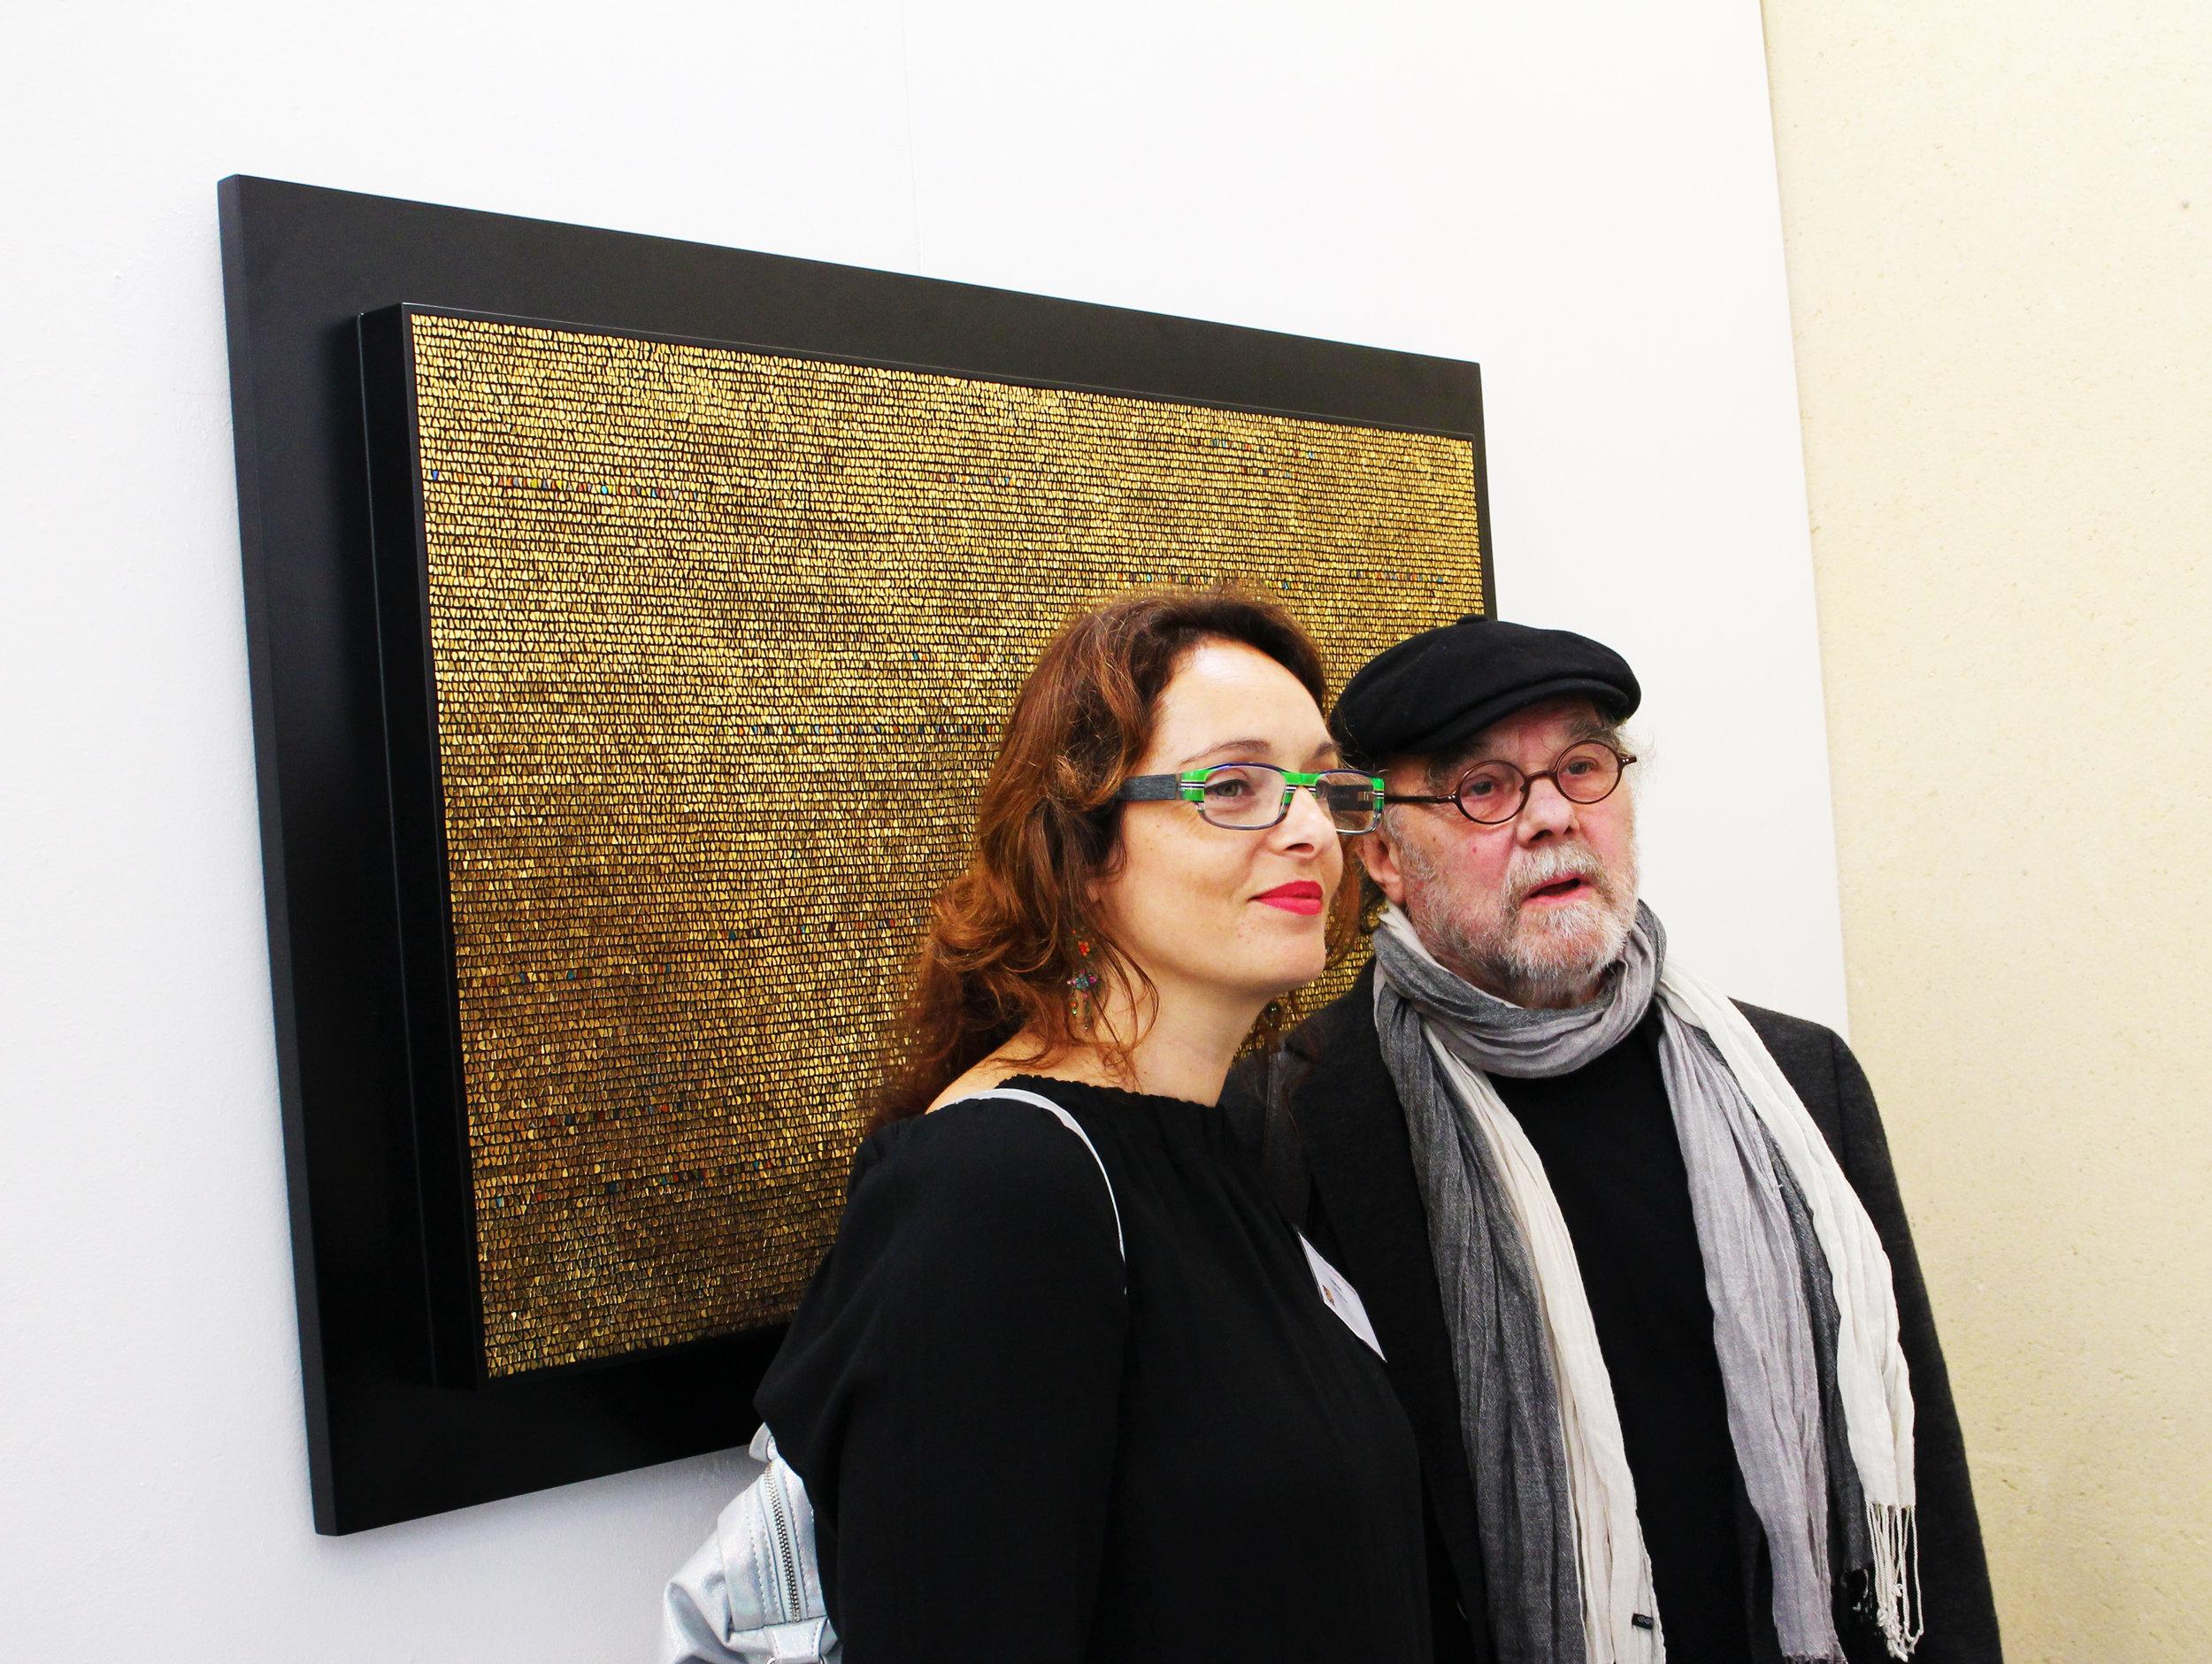 Nathalie Vin and Gerard Brand